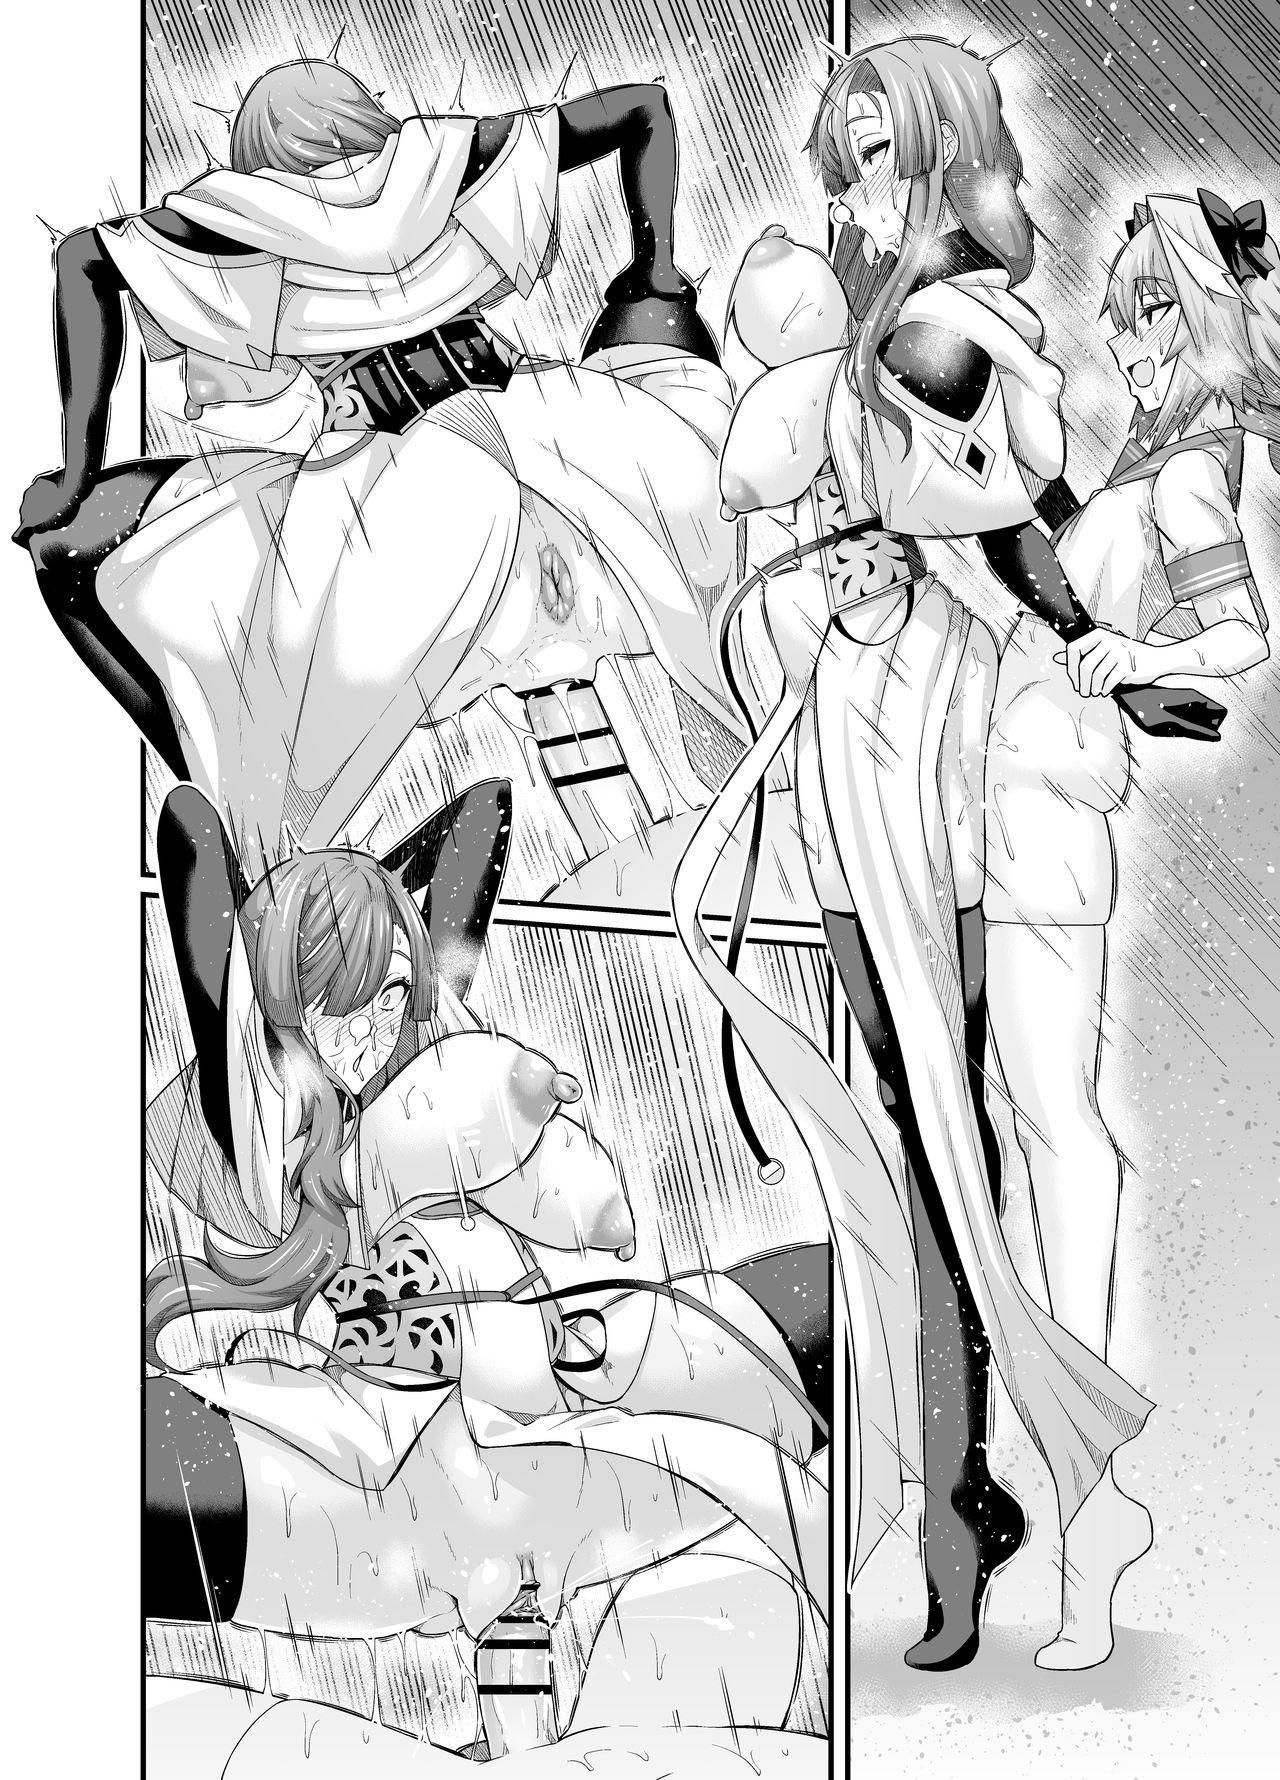 Miss Crane, Astolfo to Nakayoku Naru 8